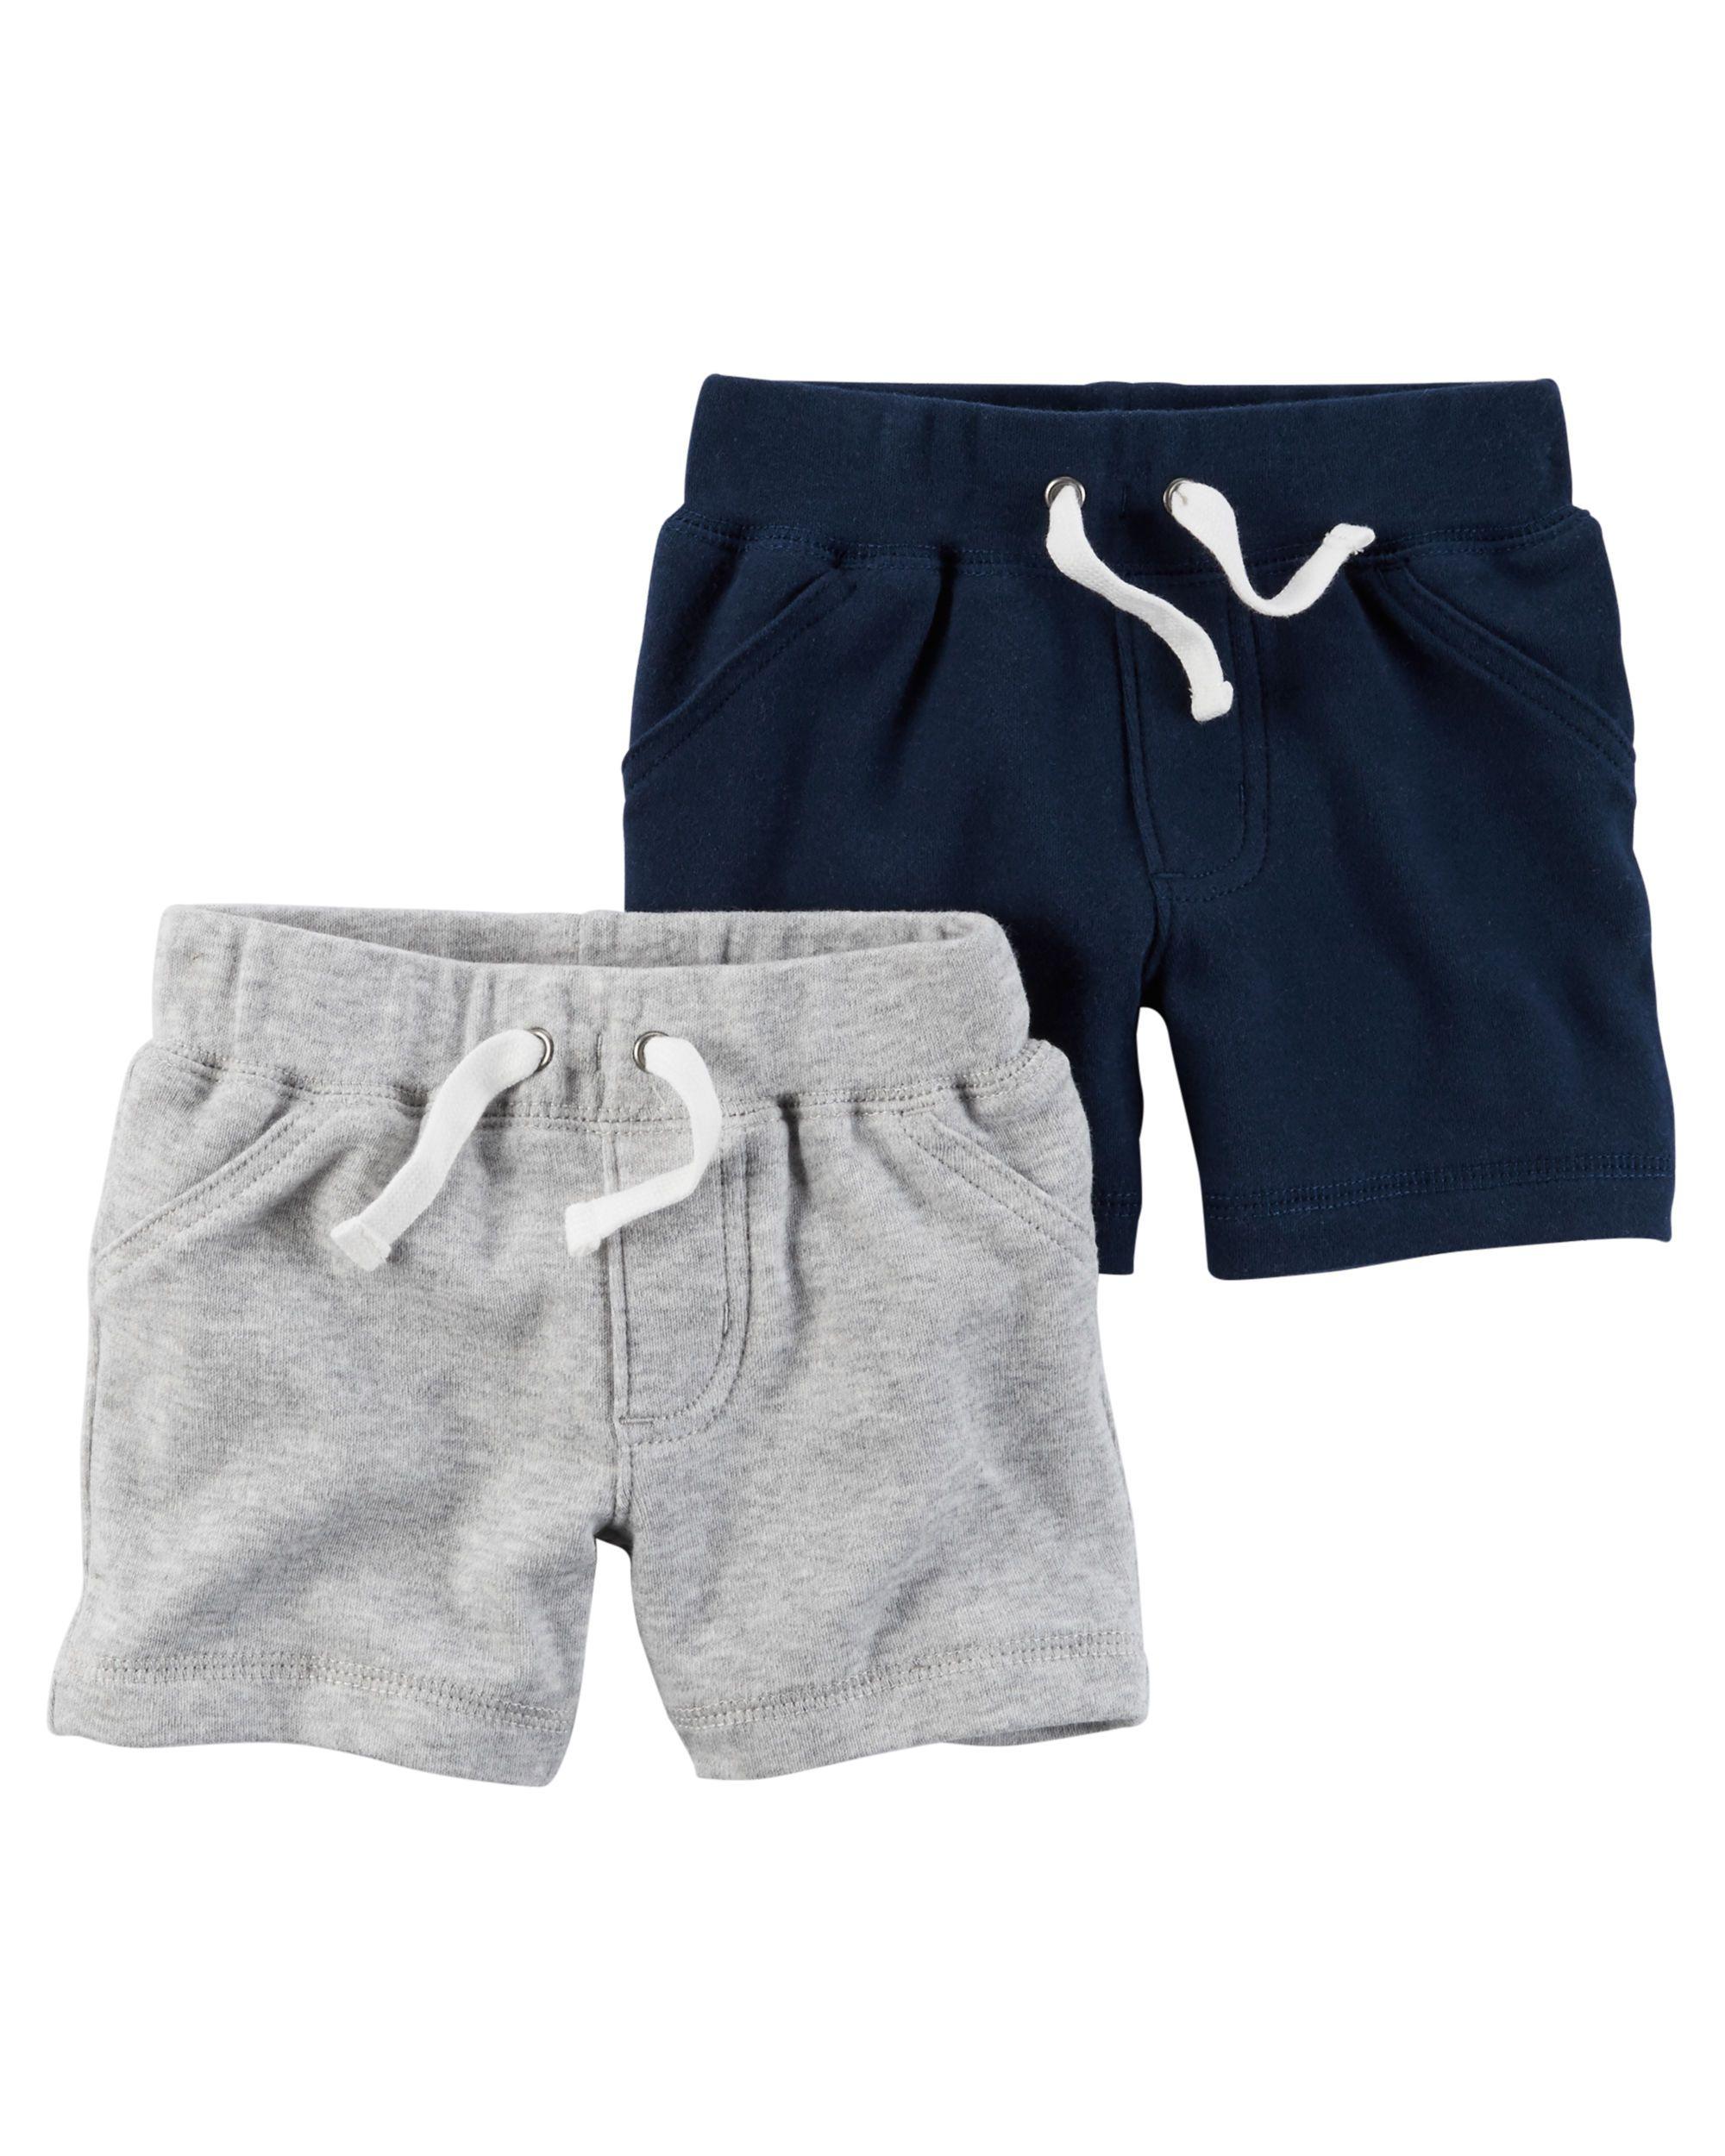 2 Pack Babysoft Shorts